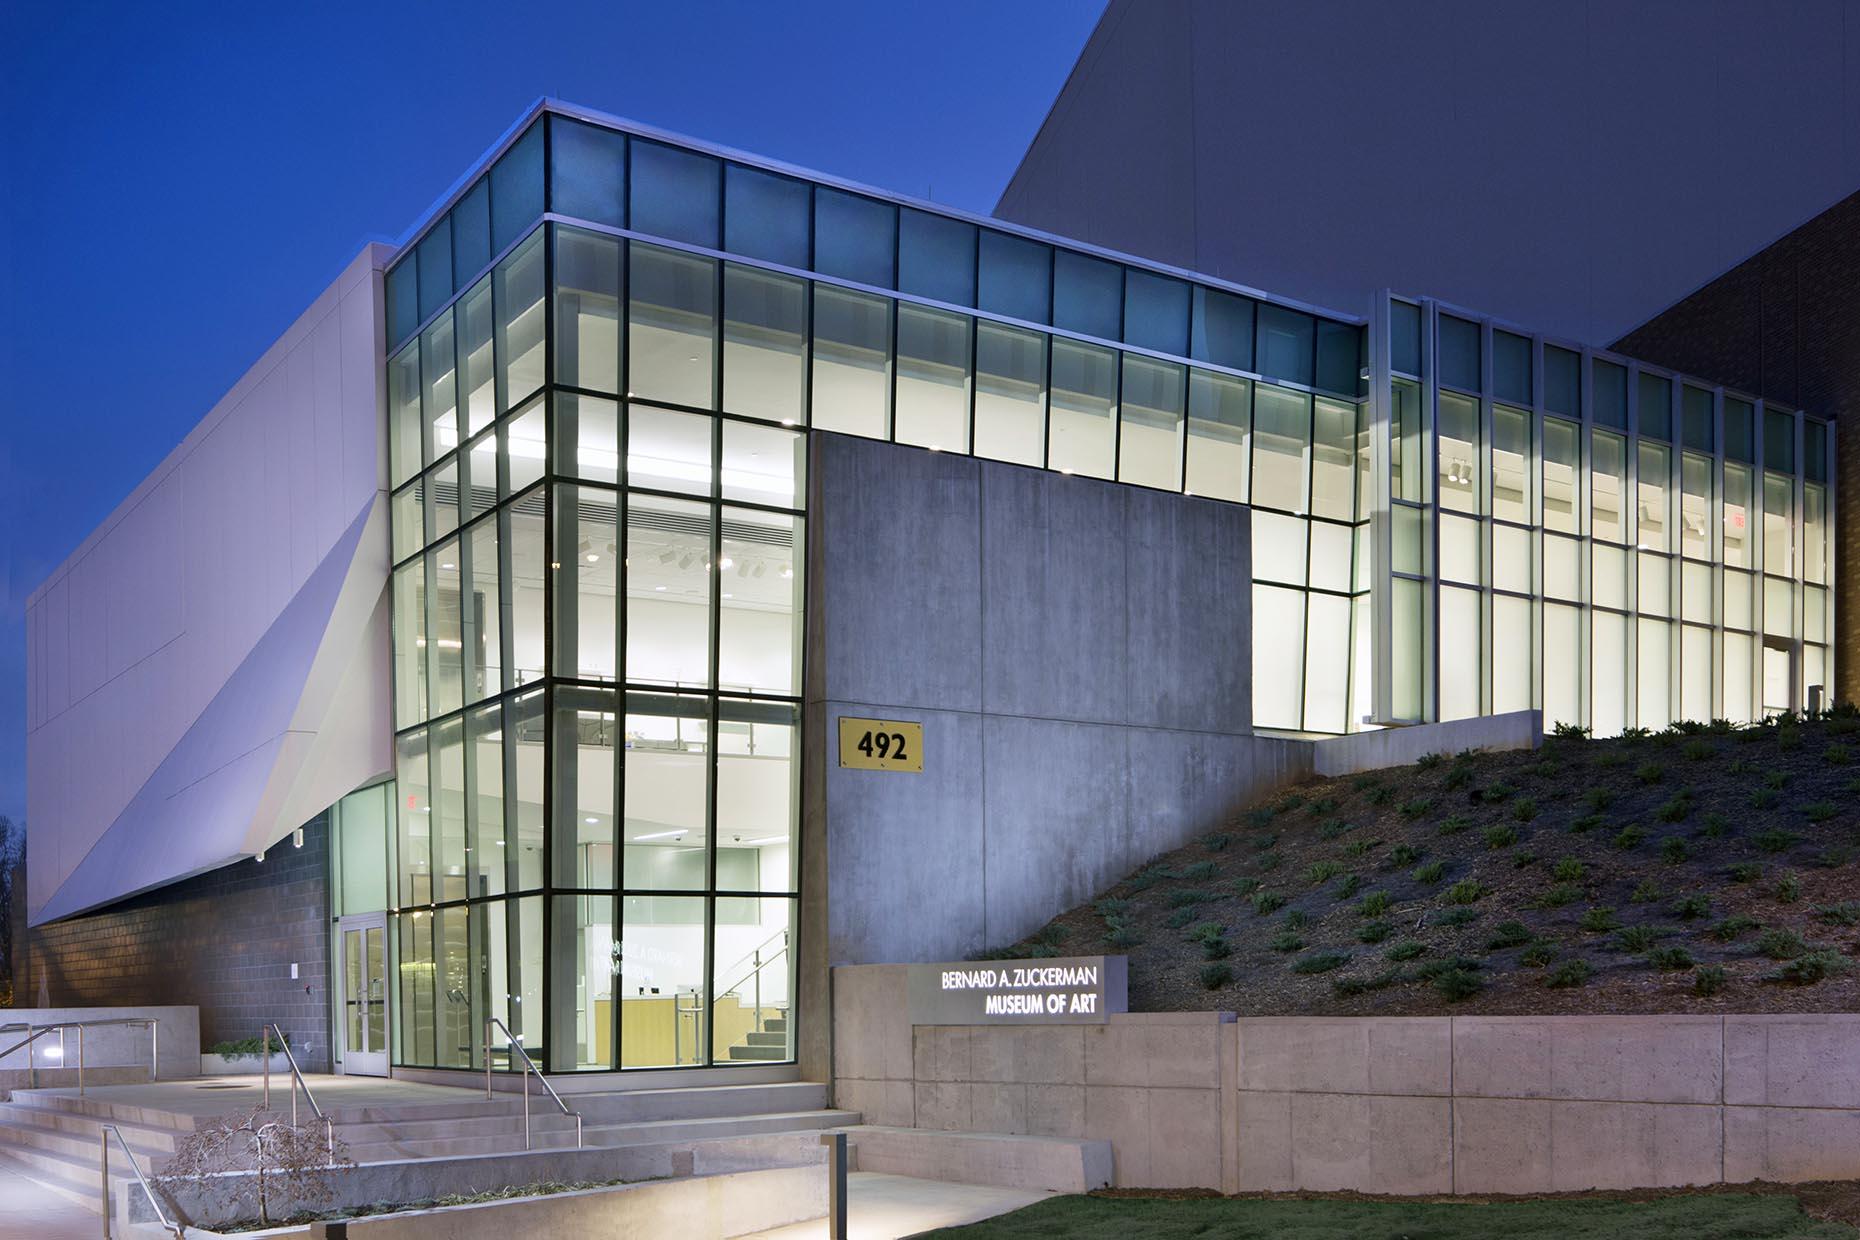 Zuckerman Museum of Art  //  Kennesaw, GA  //  Client: Stanley Beaman & Sears